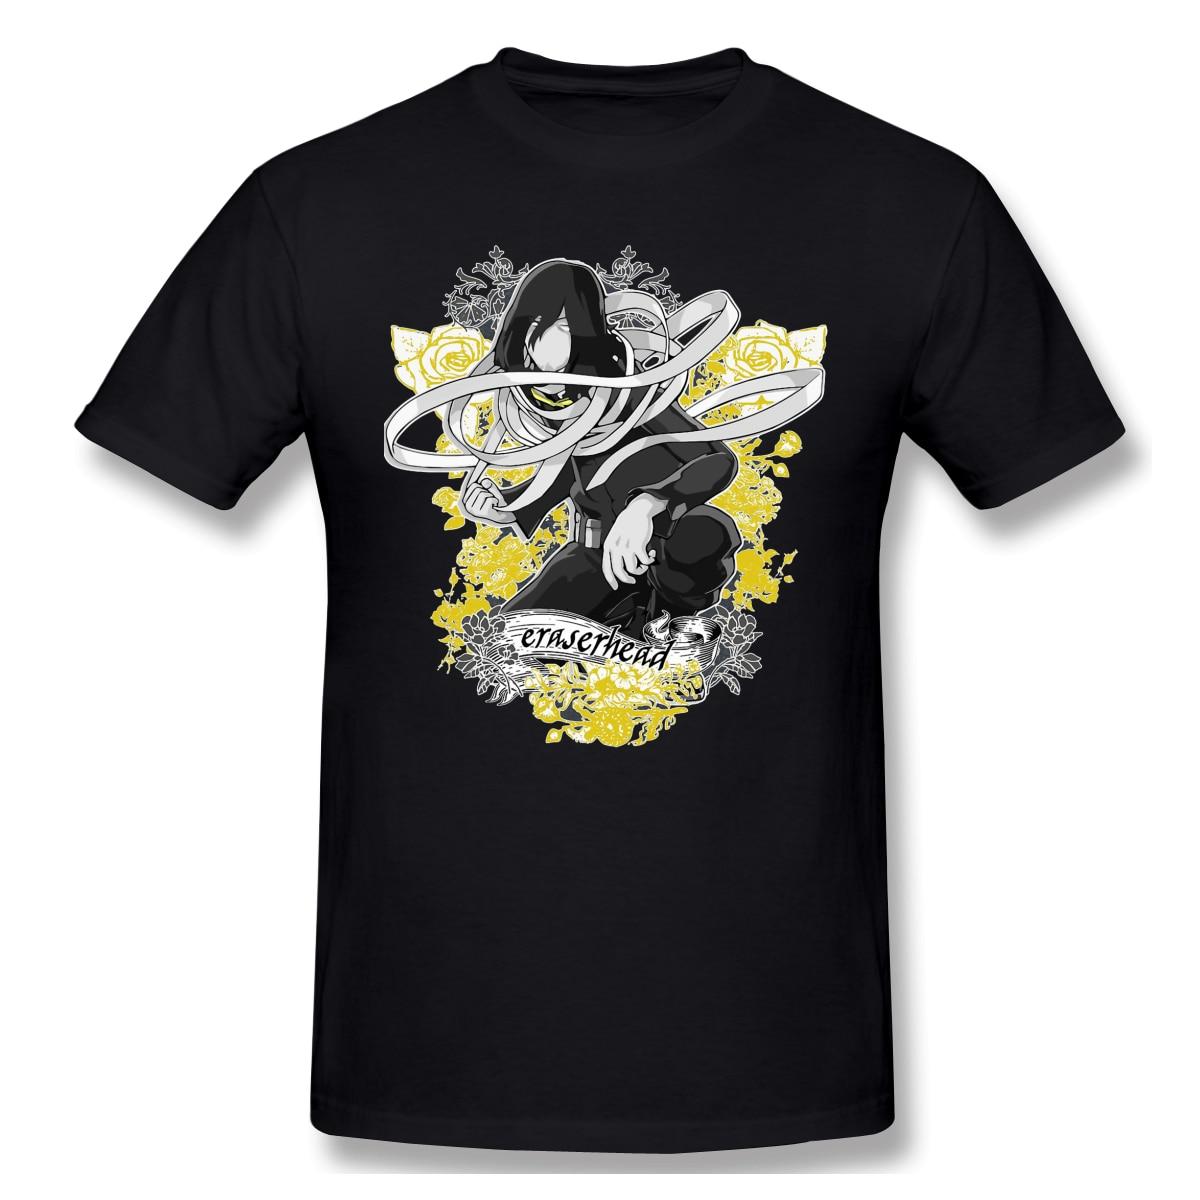 "Nuevo verano T camisa ""Cabeza borradora"" flor héroe Aizawa Shota Academia Camiseta 100% algodón Bakugo Katsuki Tee camisa Camiseta básica"